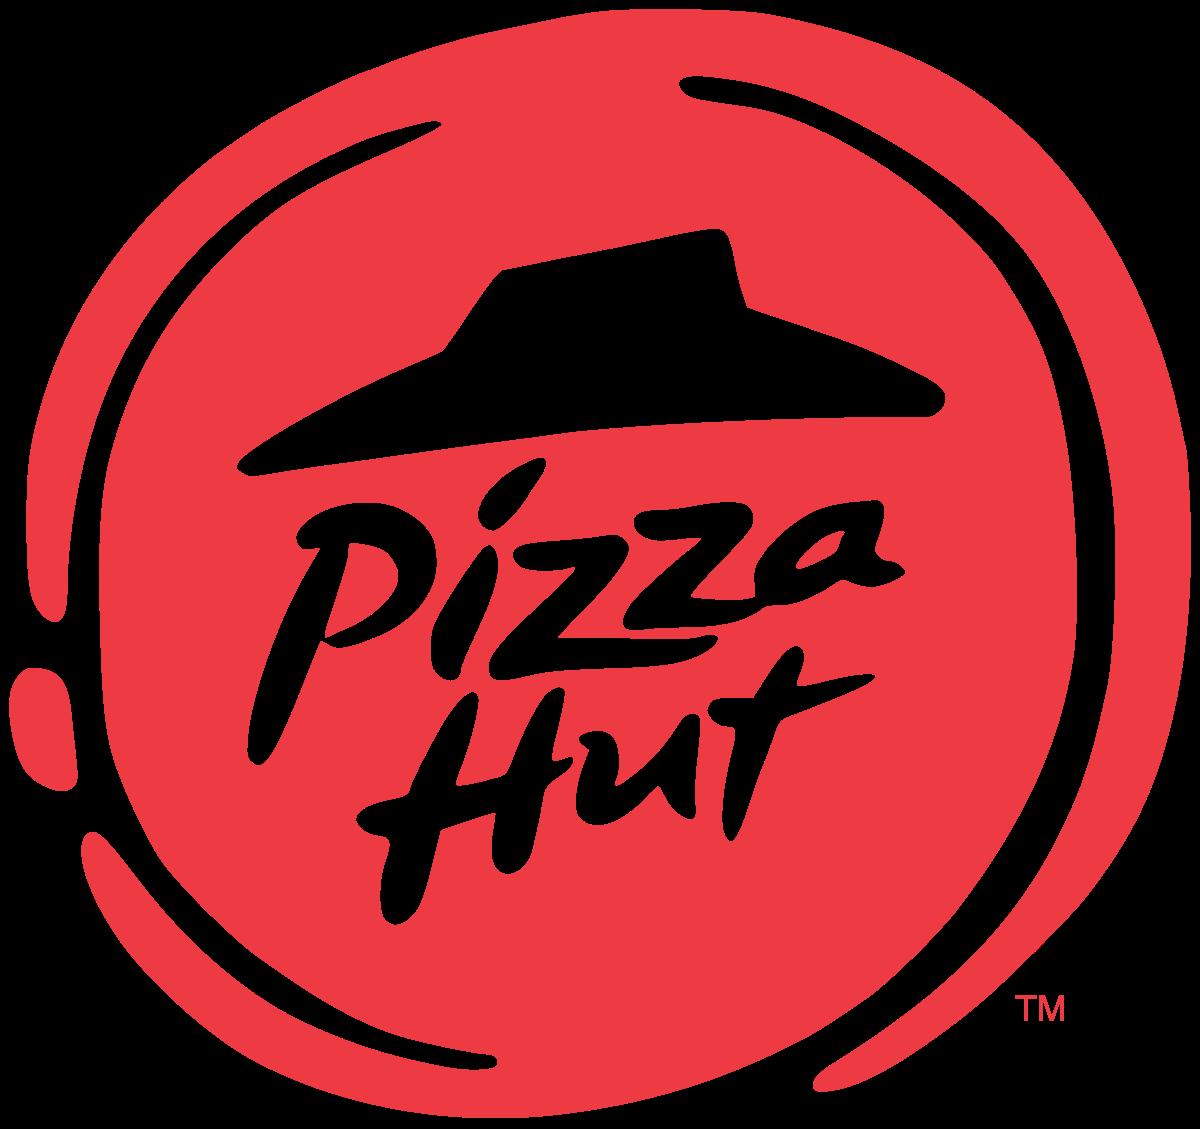 Pizza Hut (Blvd)